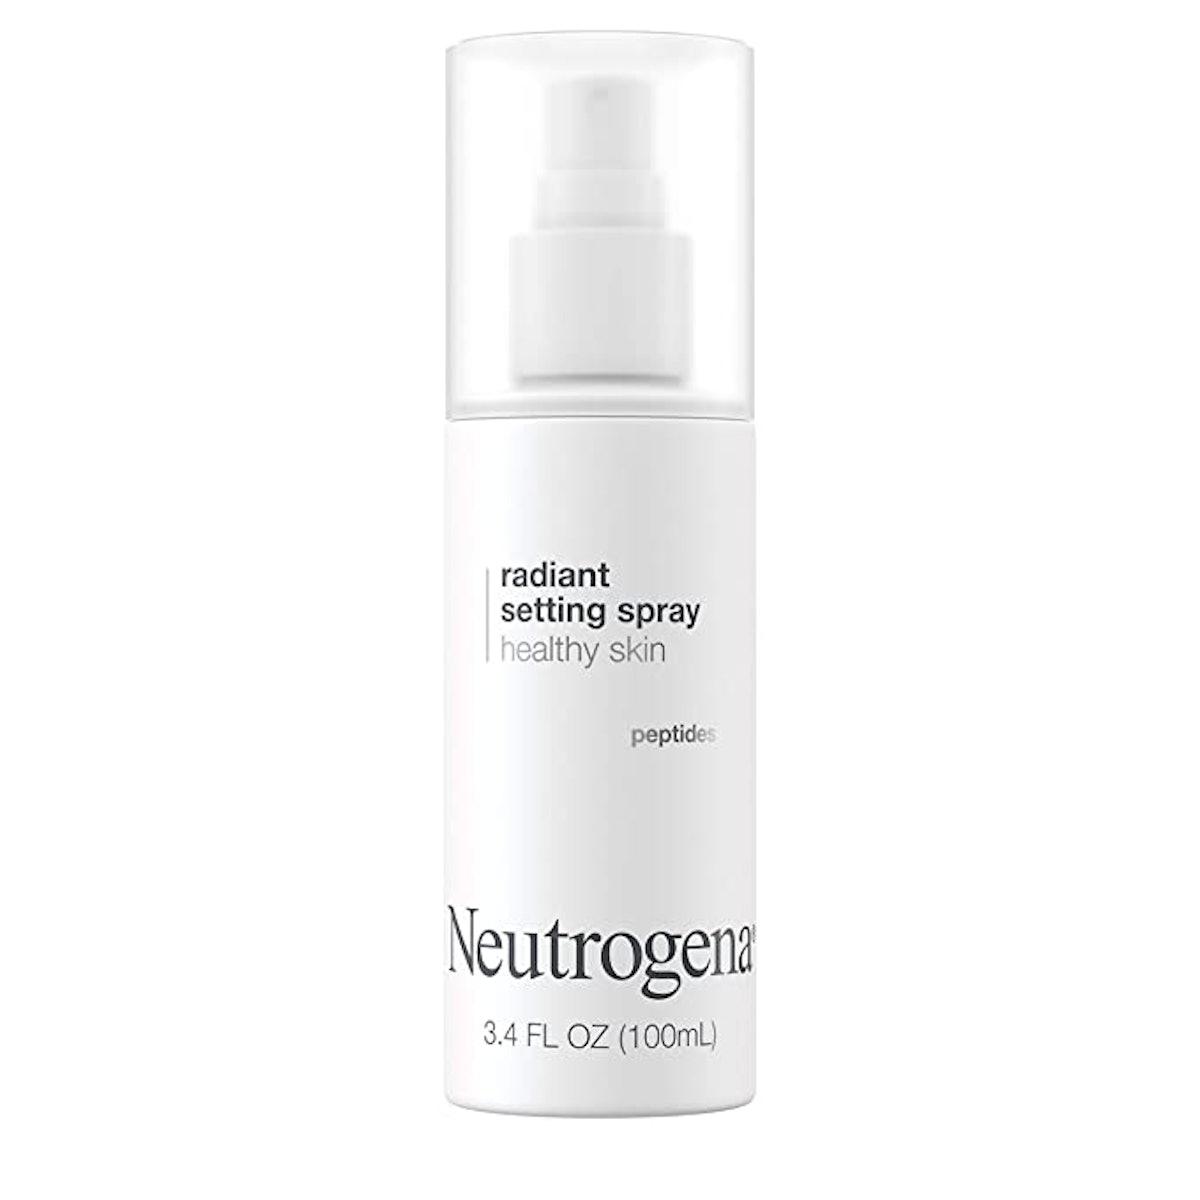 Neutrogena Healthy Skin Radiant Makeup Setting Spray